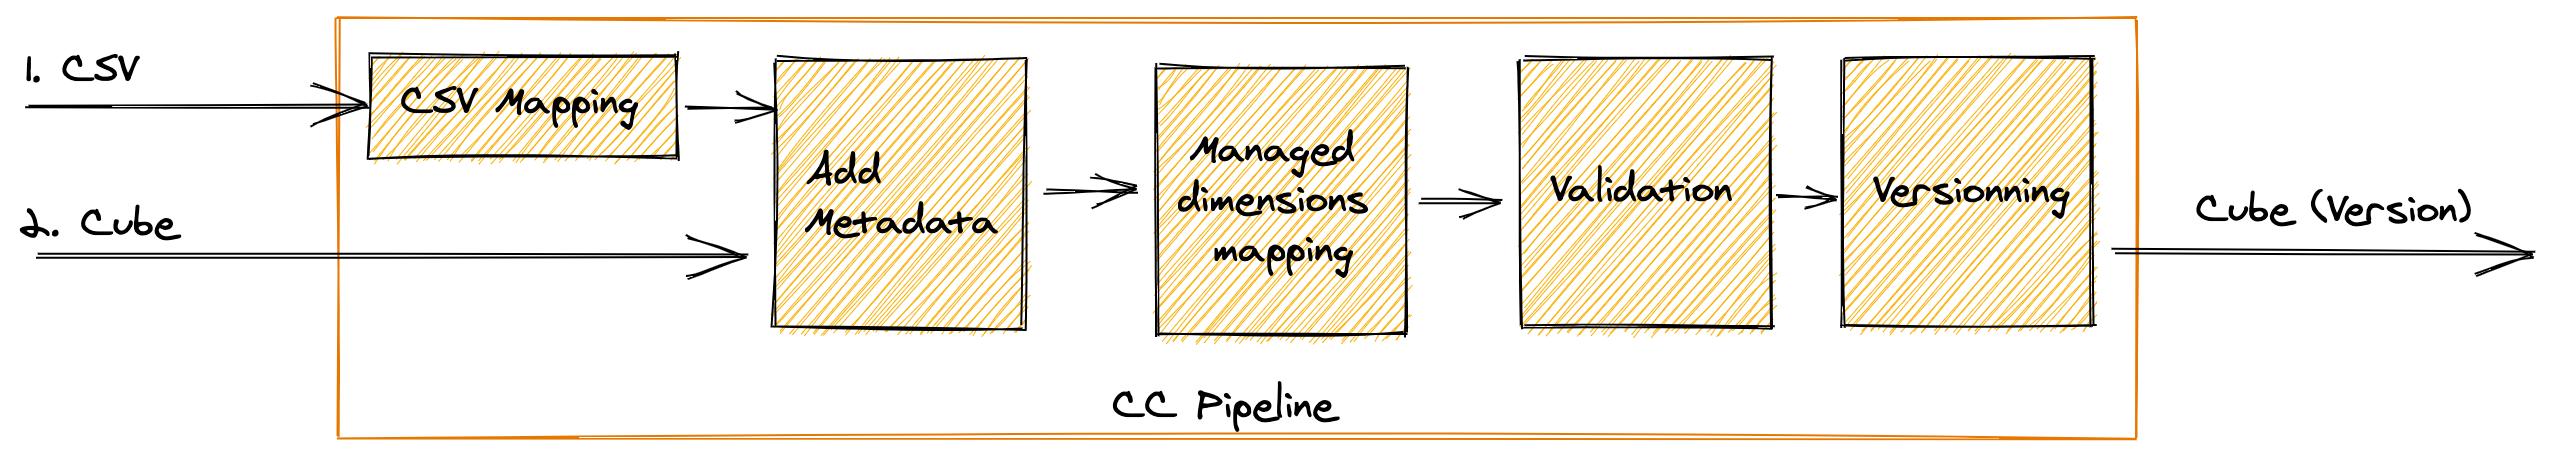 cc_high-level-data-flow